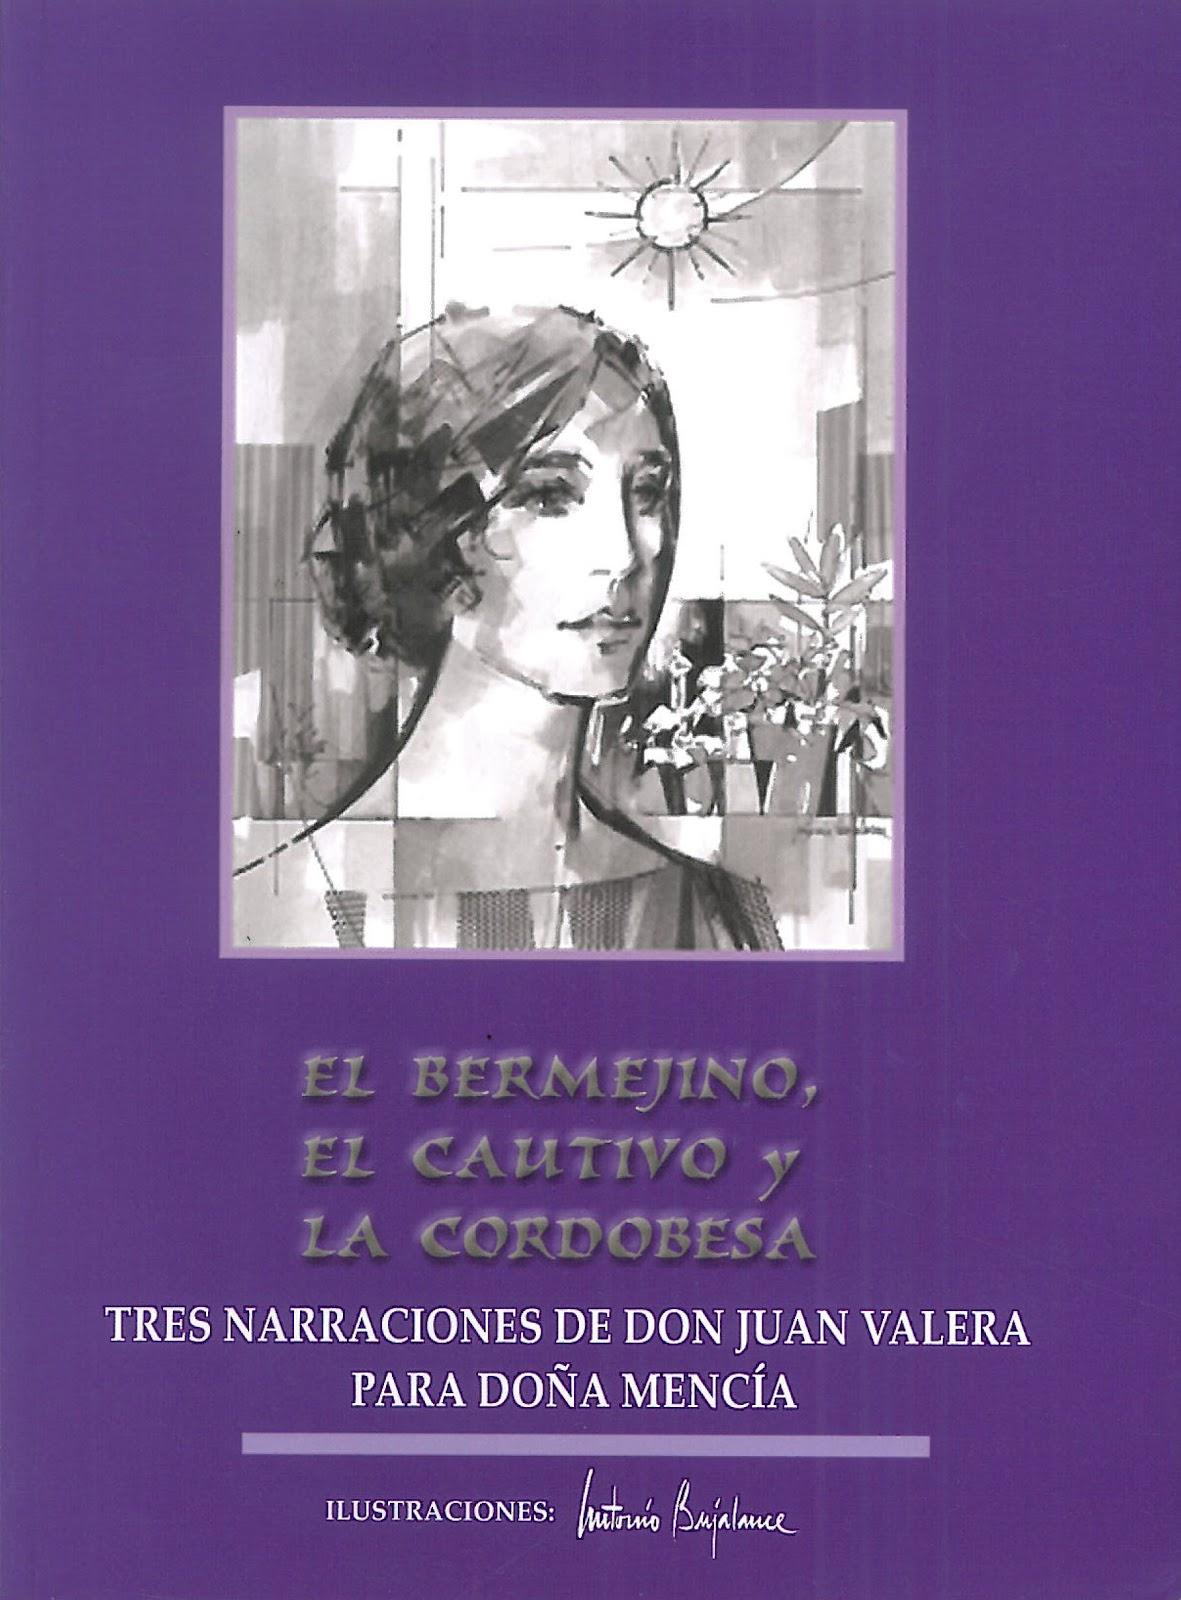 Delegaci n de cultura do a menc a libros - Fotos de dona mencia ...